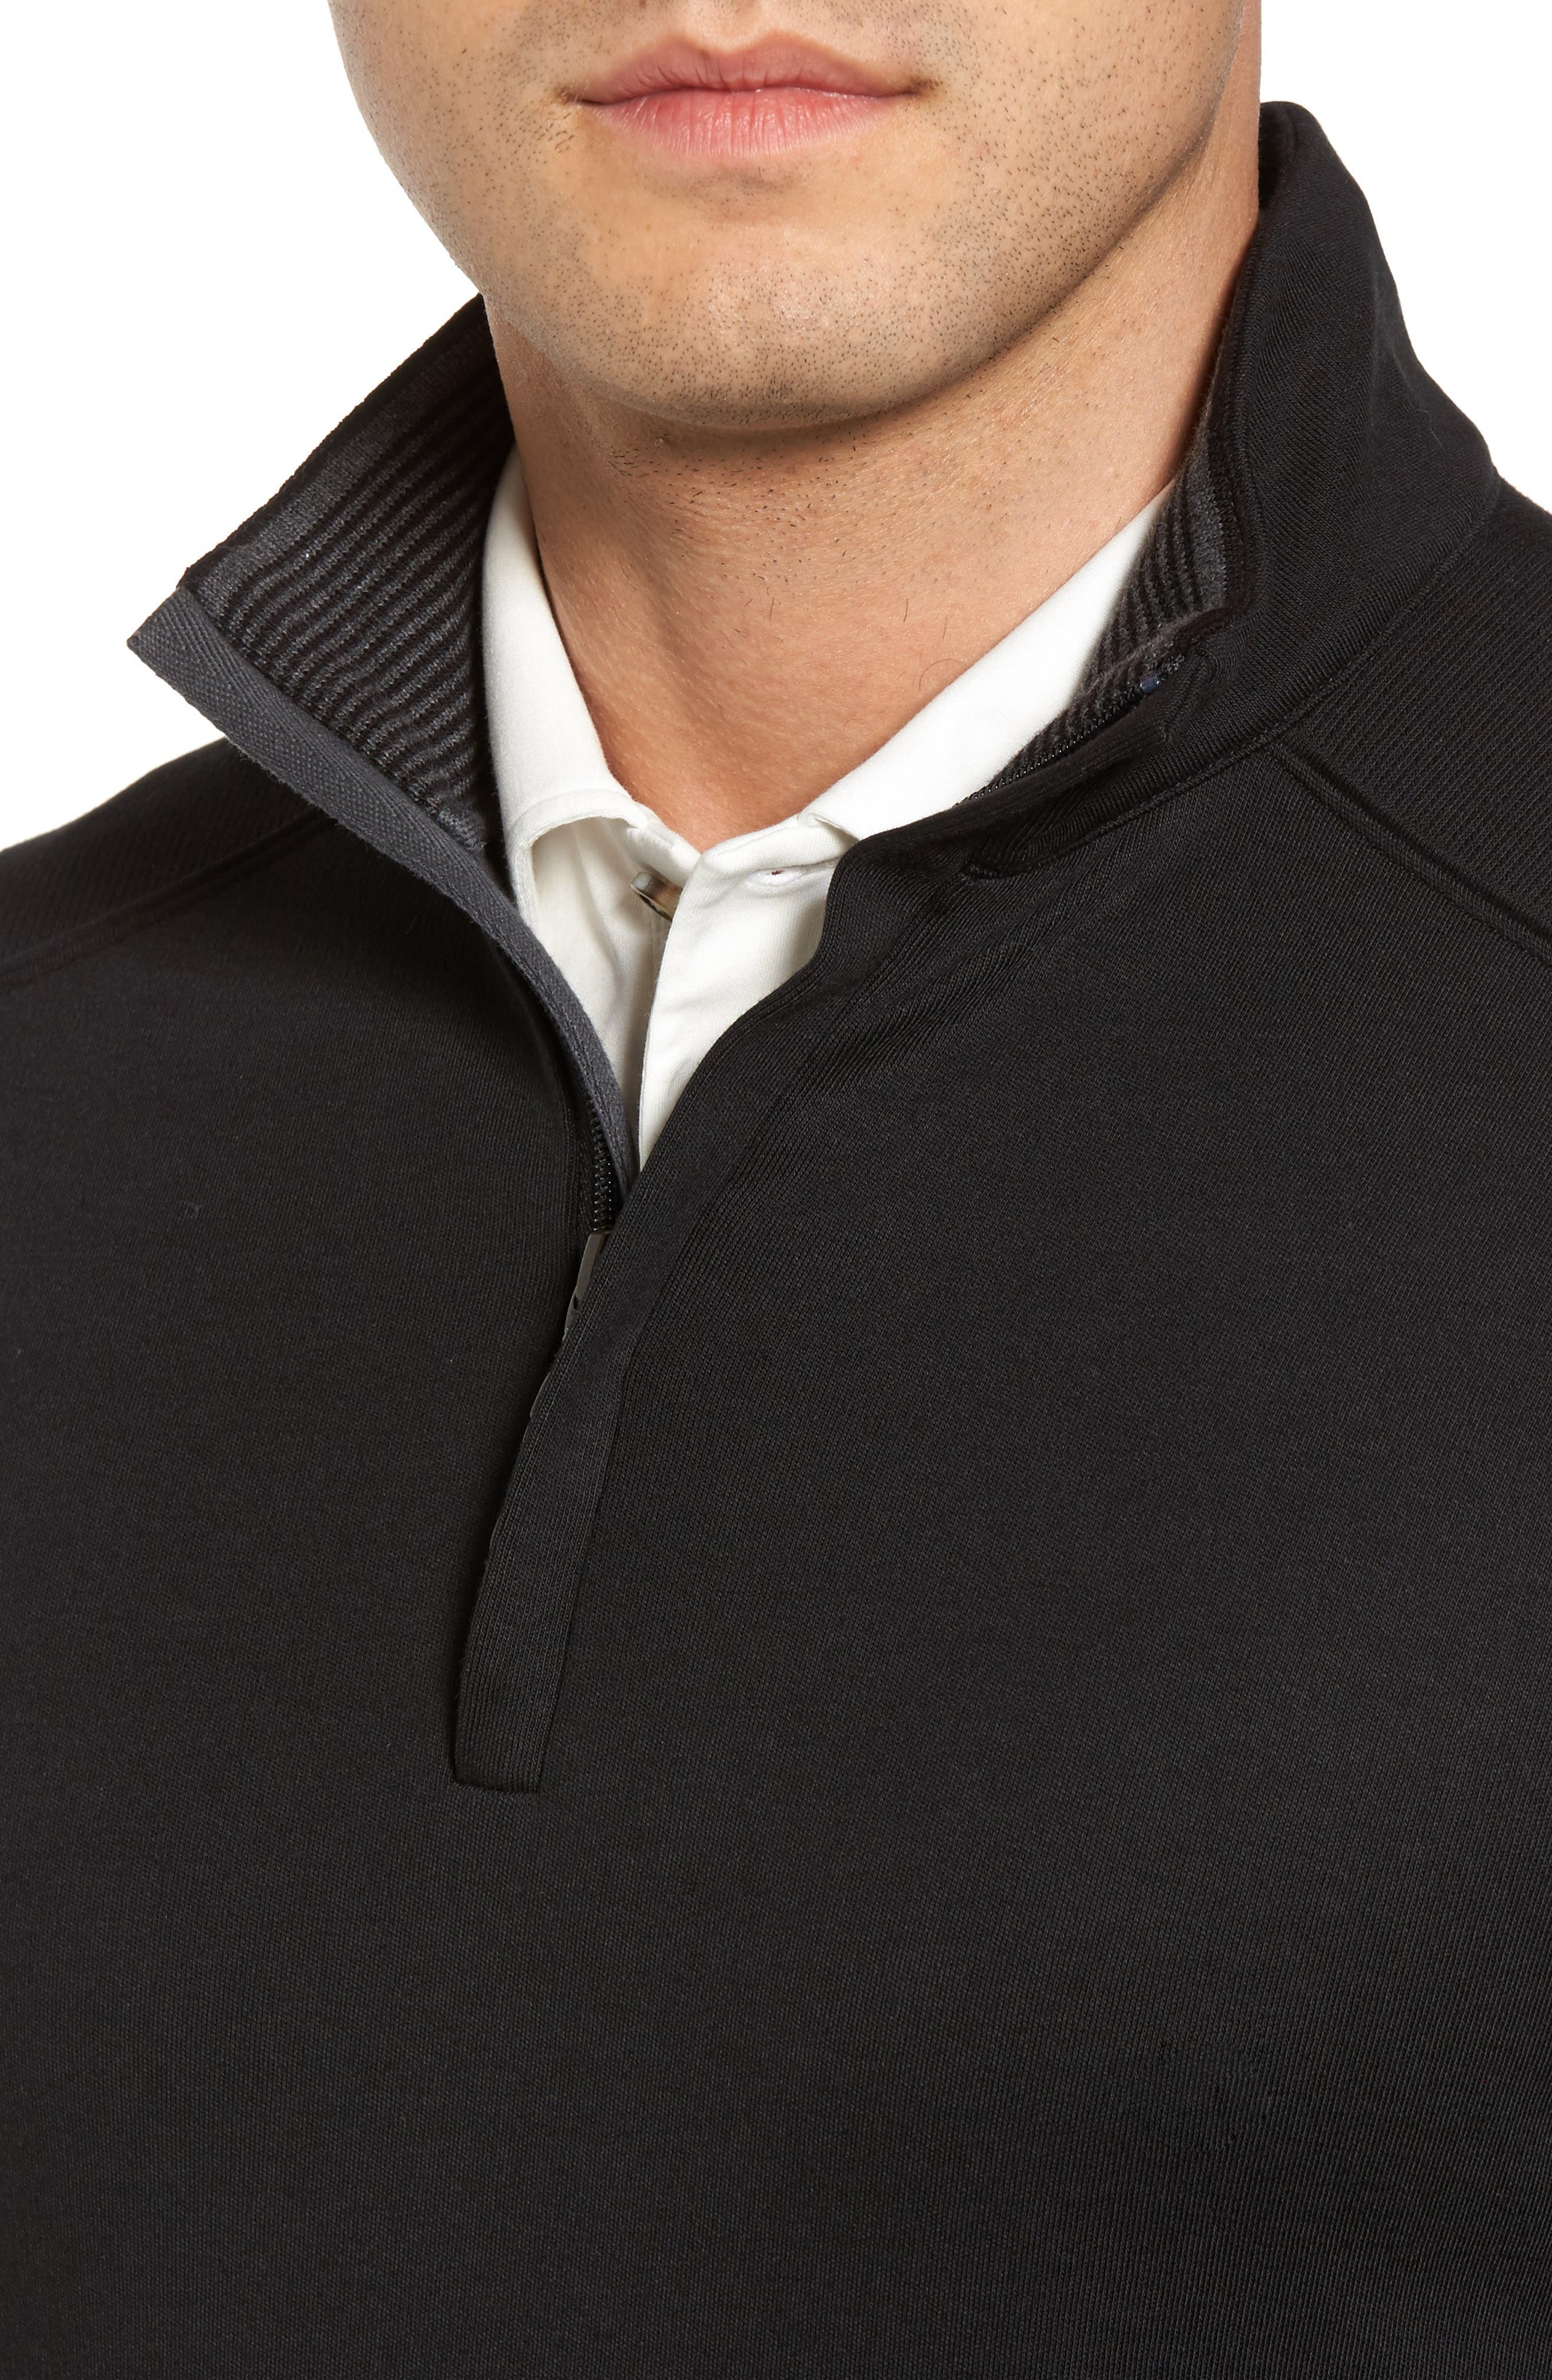 Interlock Knit Quarter Zip Pullover,                             Alternate thumbnail 4, color,                             Black